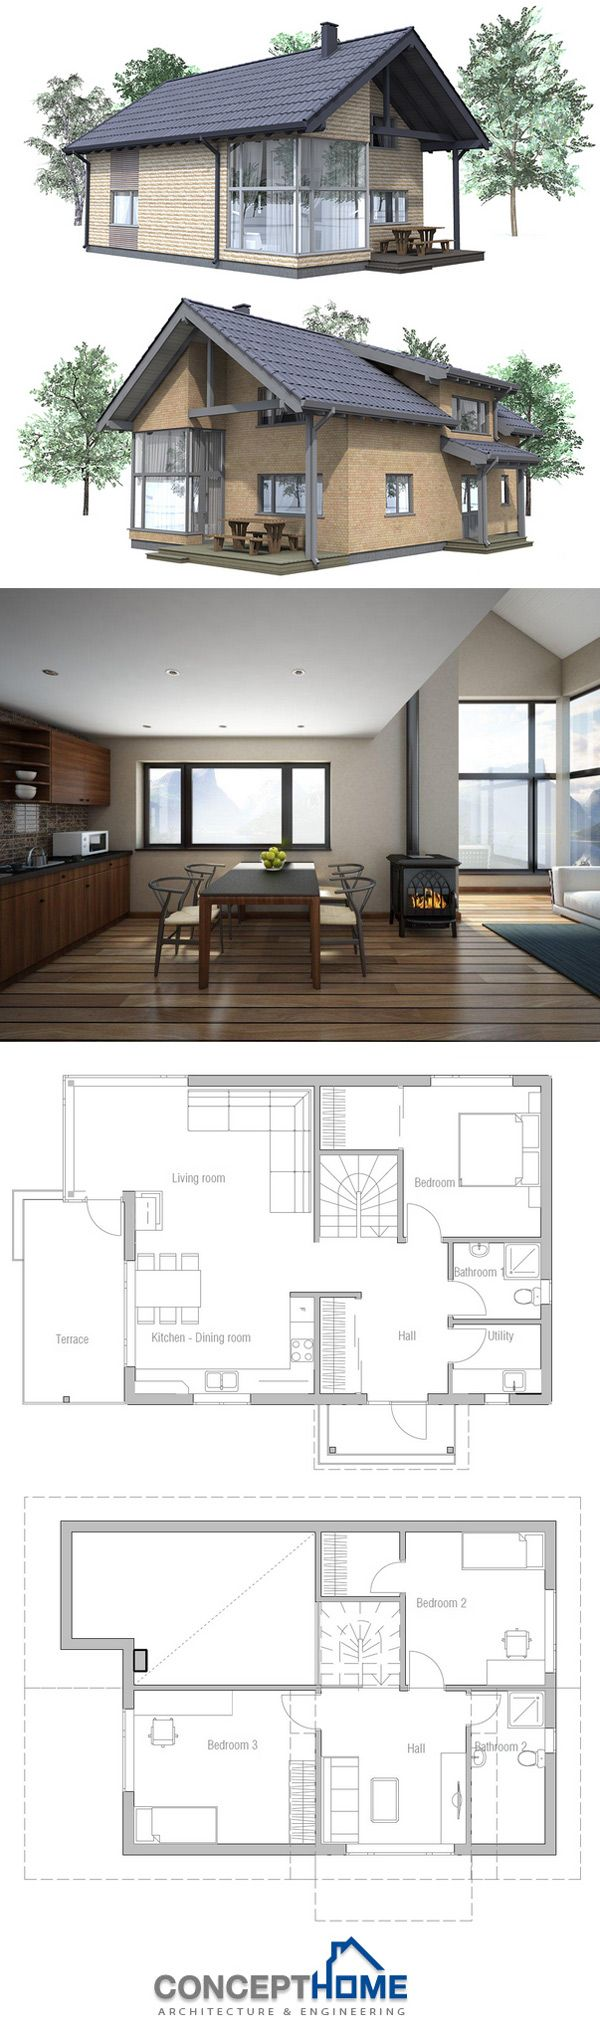 38 best tiny lot house plans images on pinterest small houses tiny house and tiny house blueprint